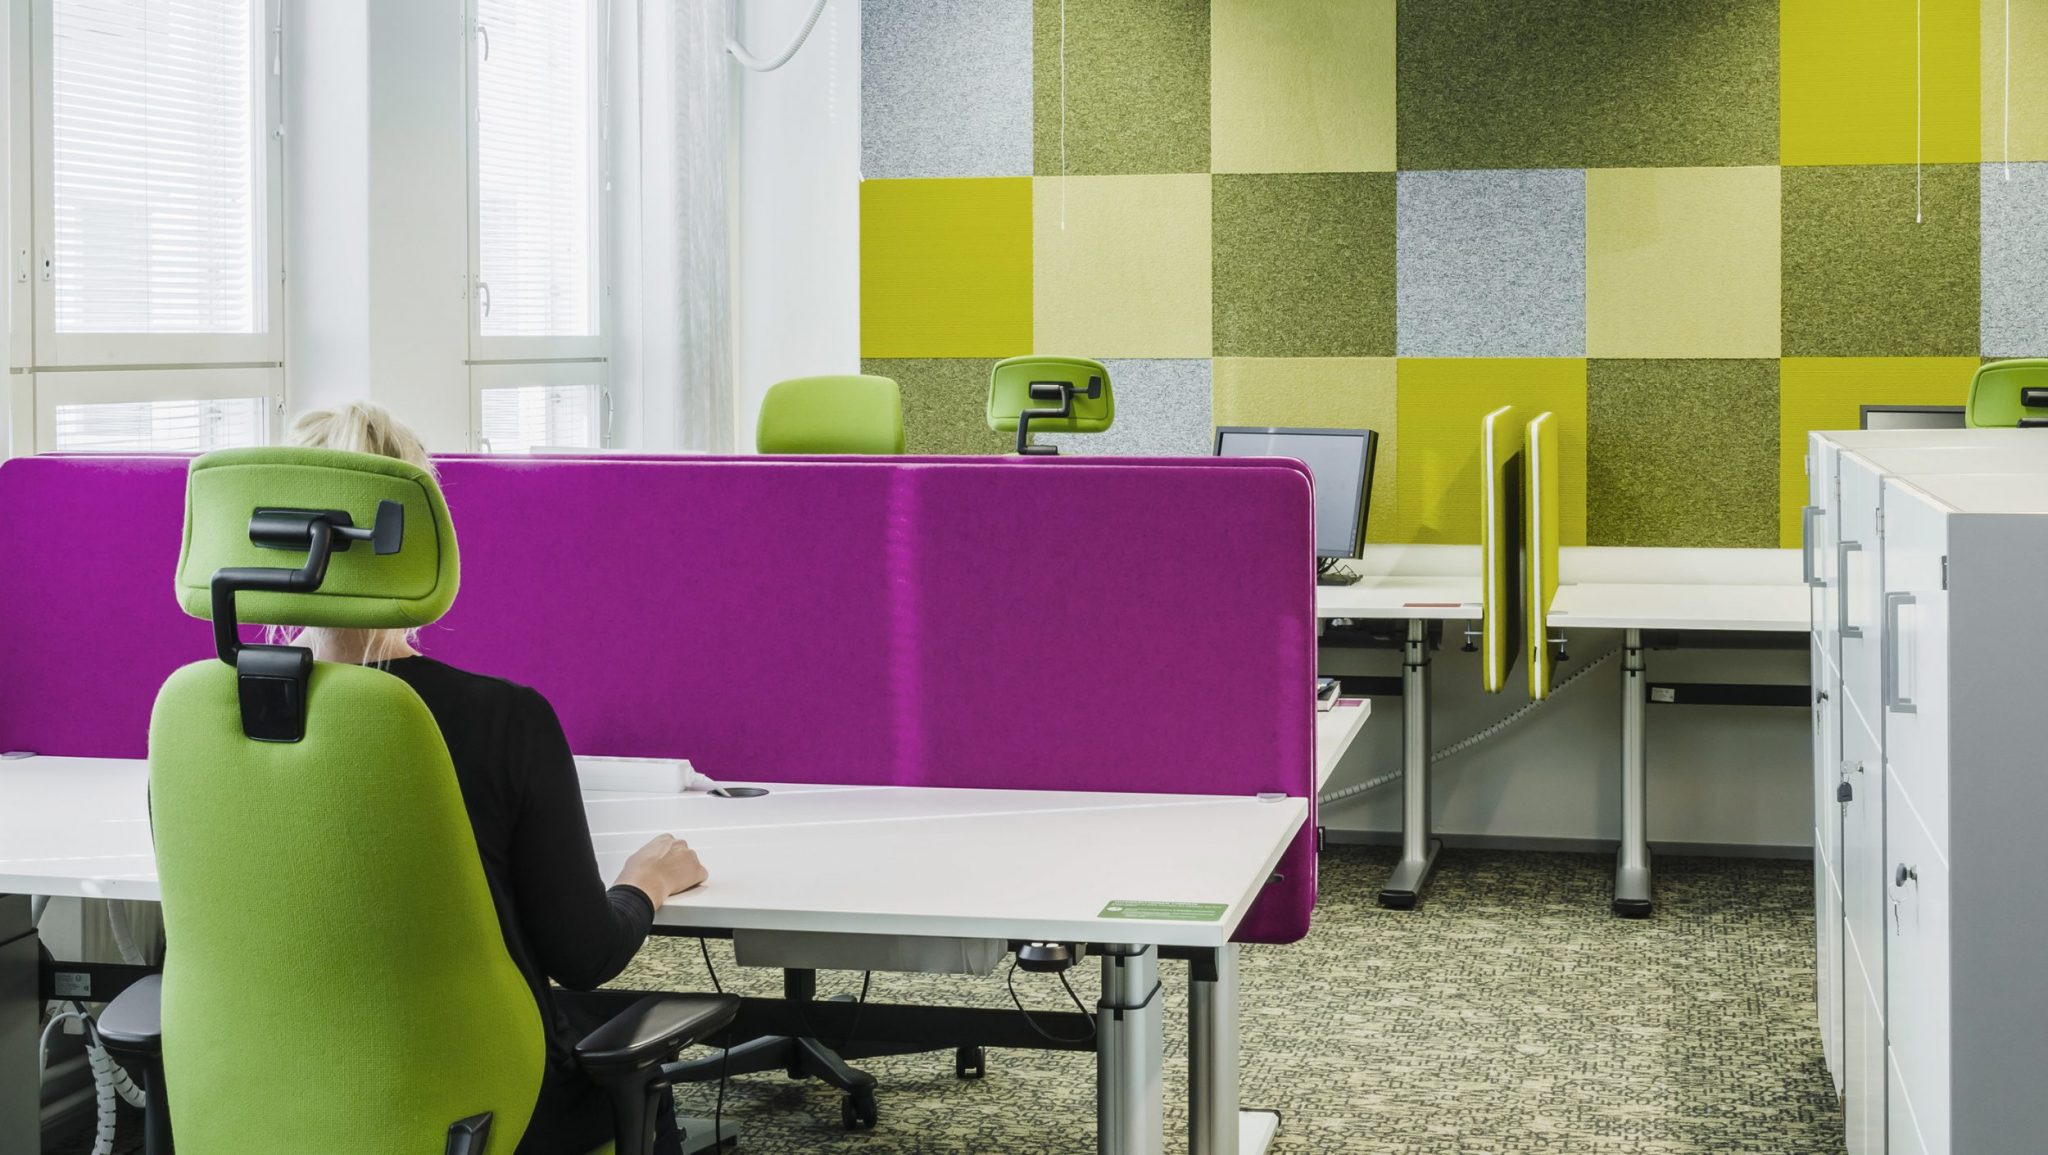 Anonymous-Activity-Based-Office-Helsinki-GI-Project